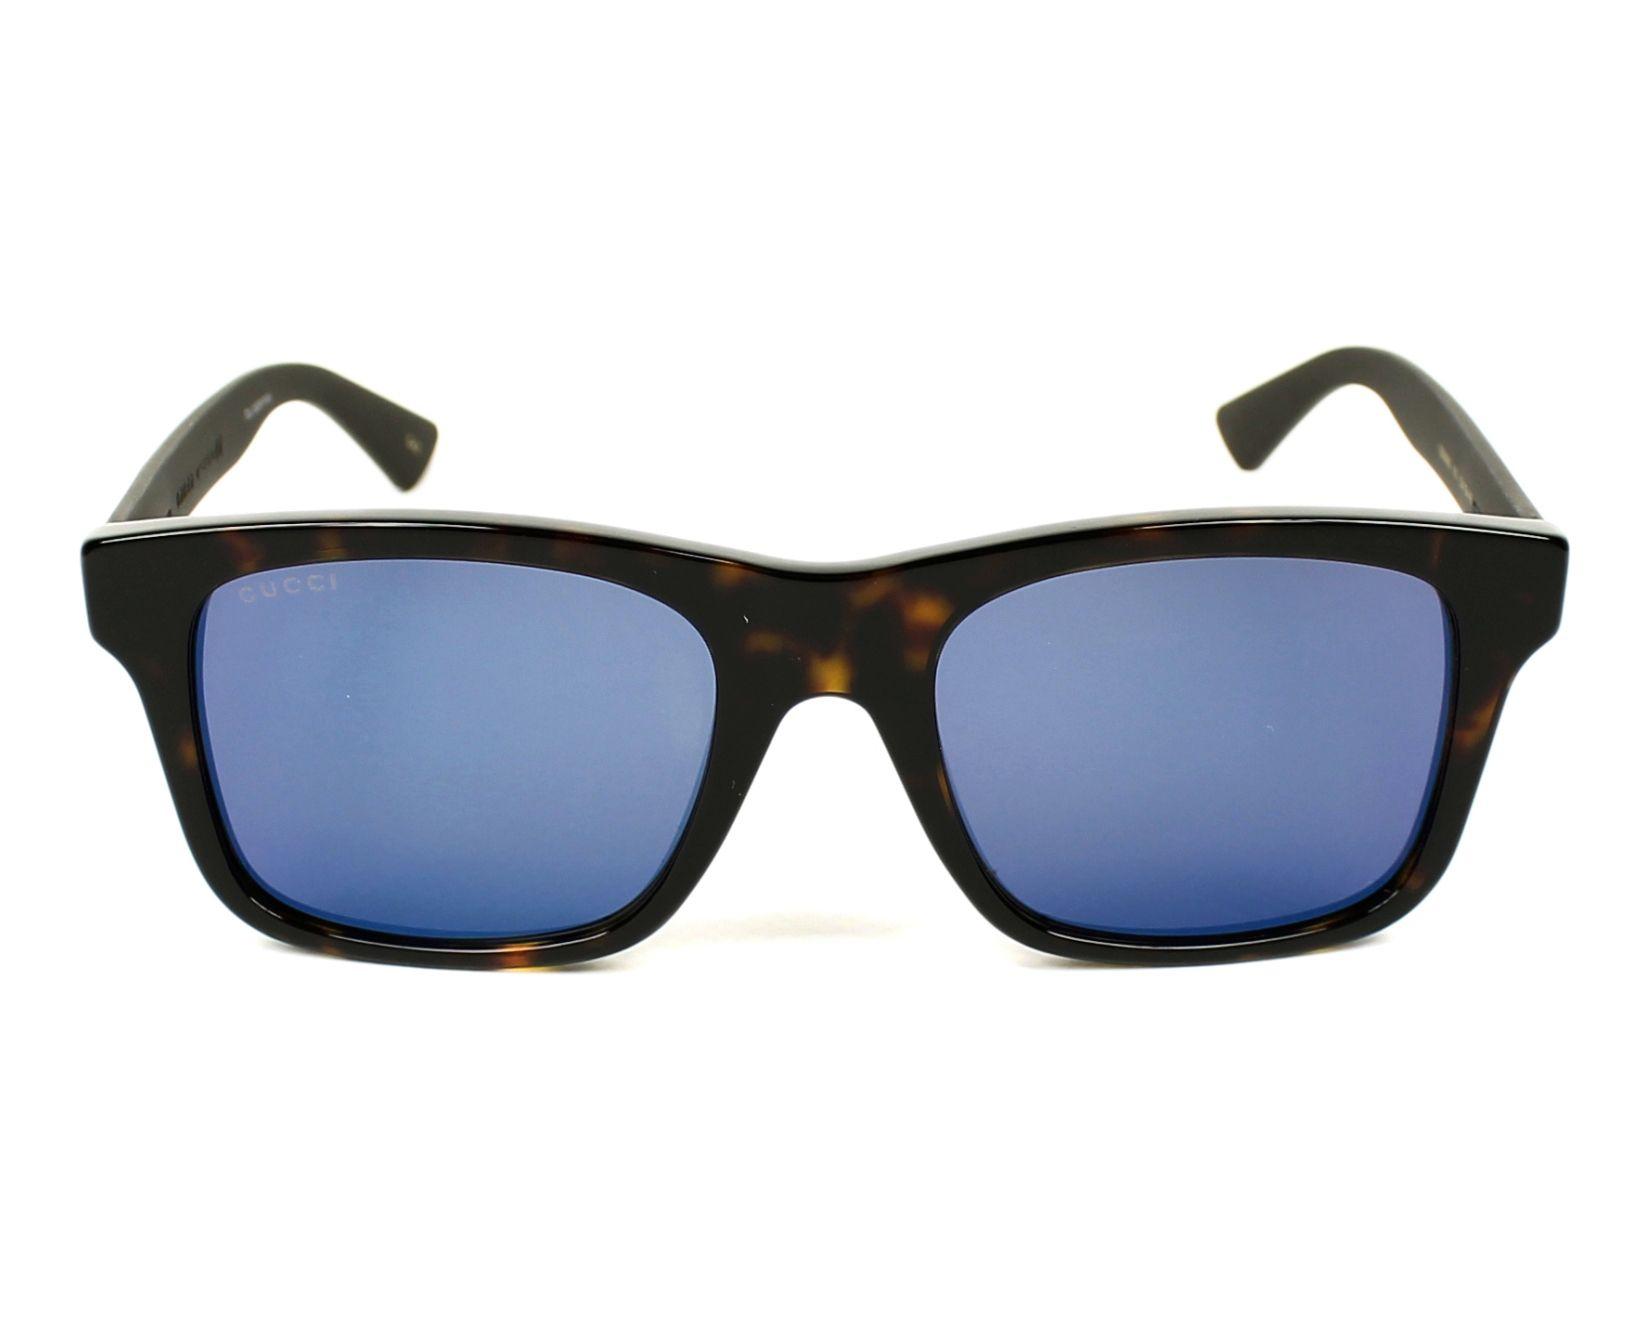 60b788d714 Sunglasses Gucci GG-0008-S 003 - Havana Brown front view